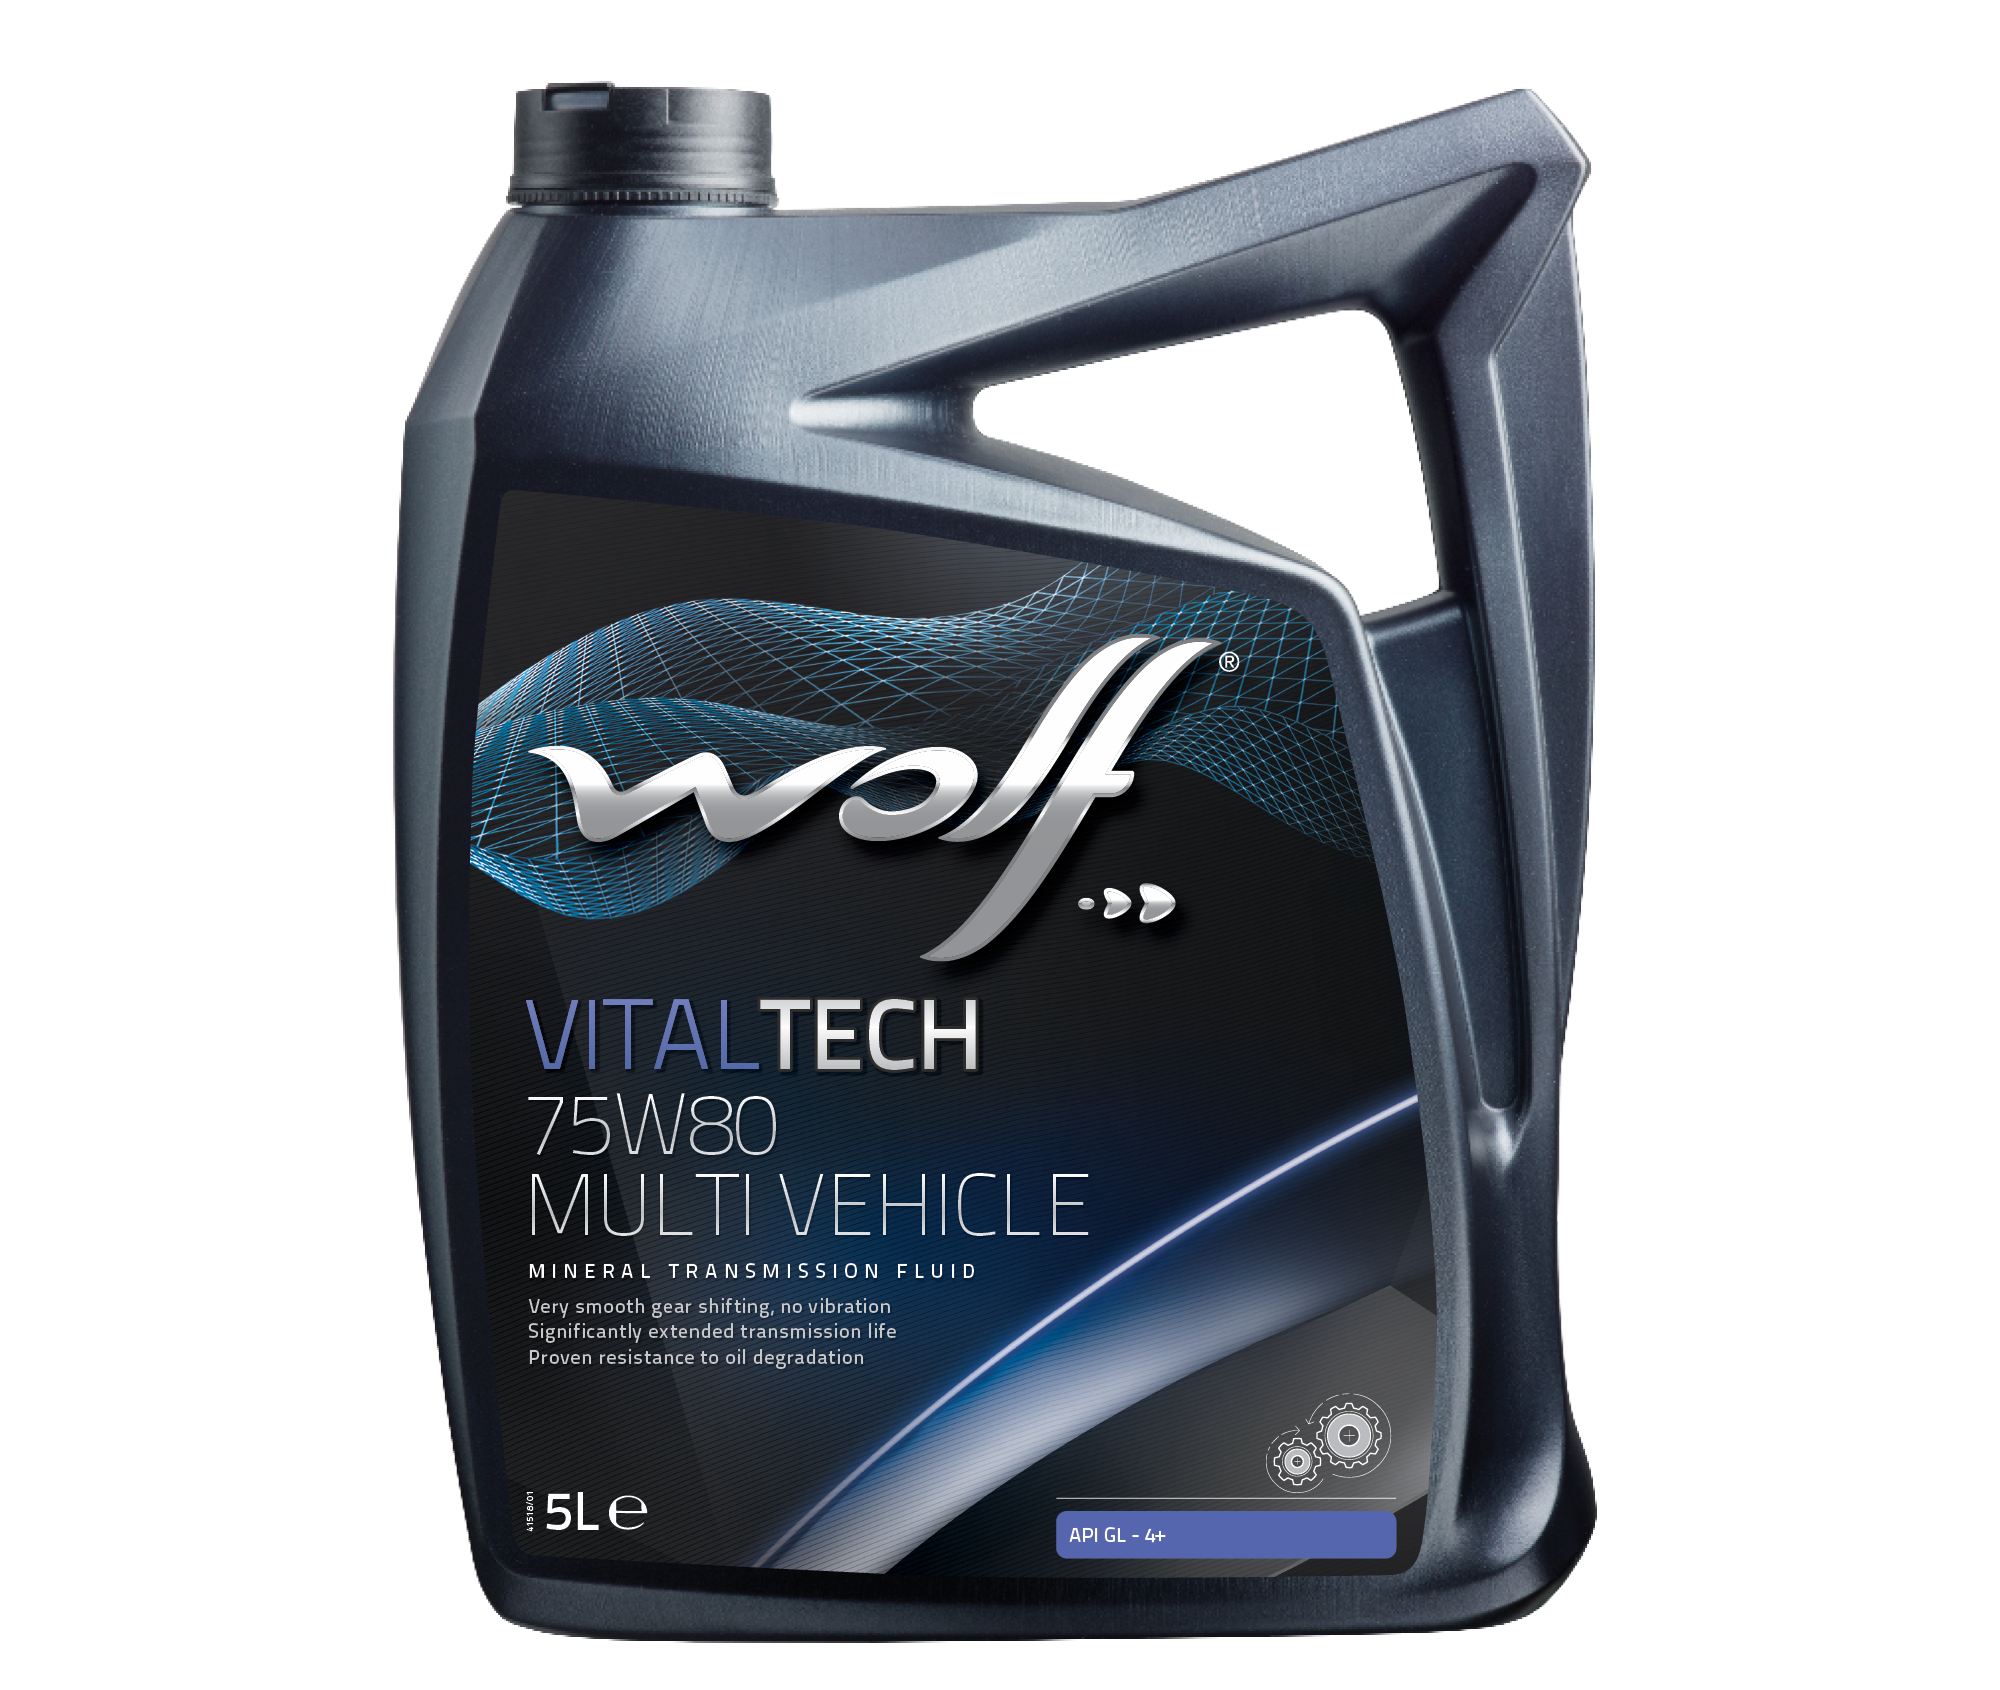 WOLF VITALTECH 75W80 MULTI VEHICLE 5L